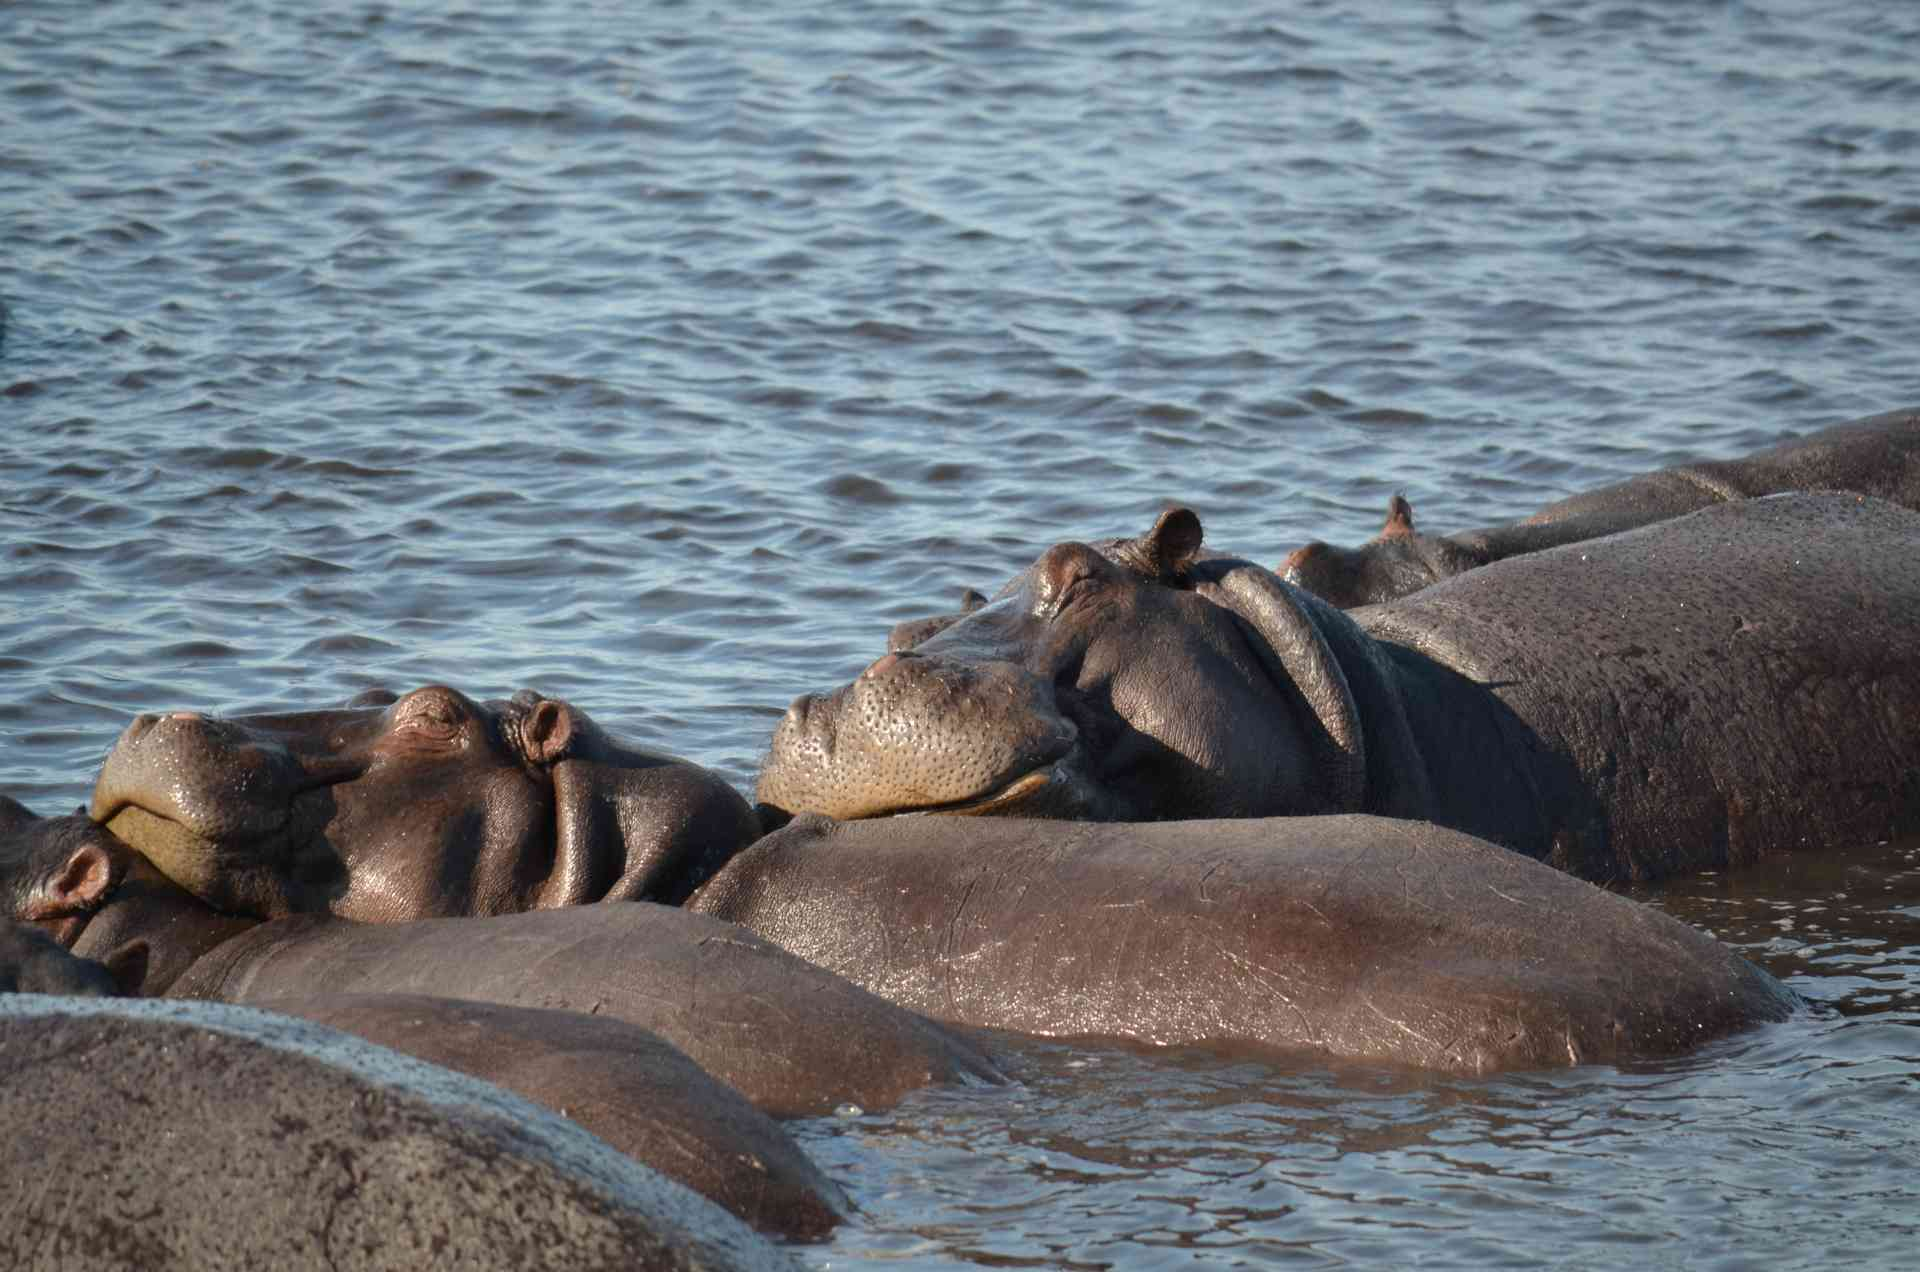 Hippos, Chobe National Park, Botswana by Annelieke Huijgens